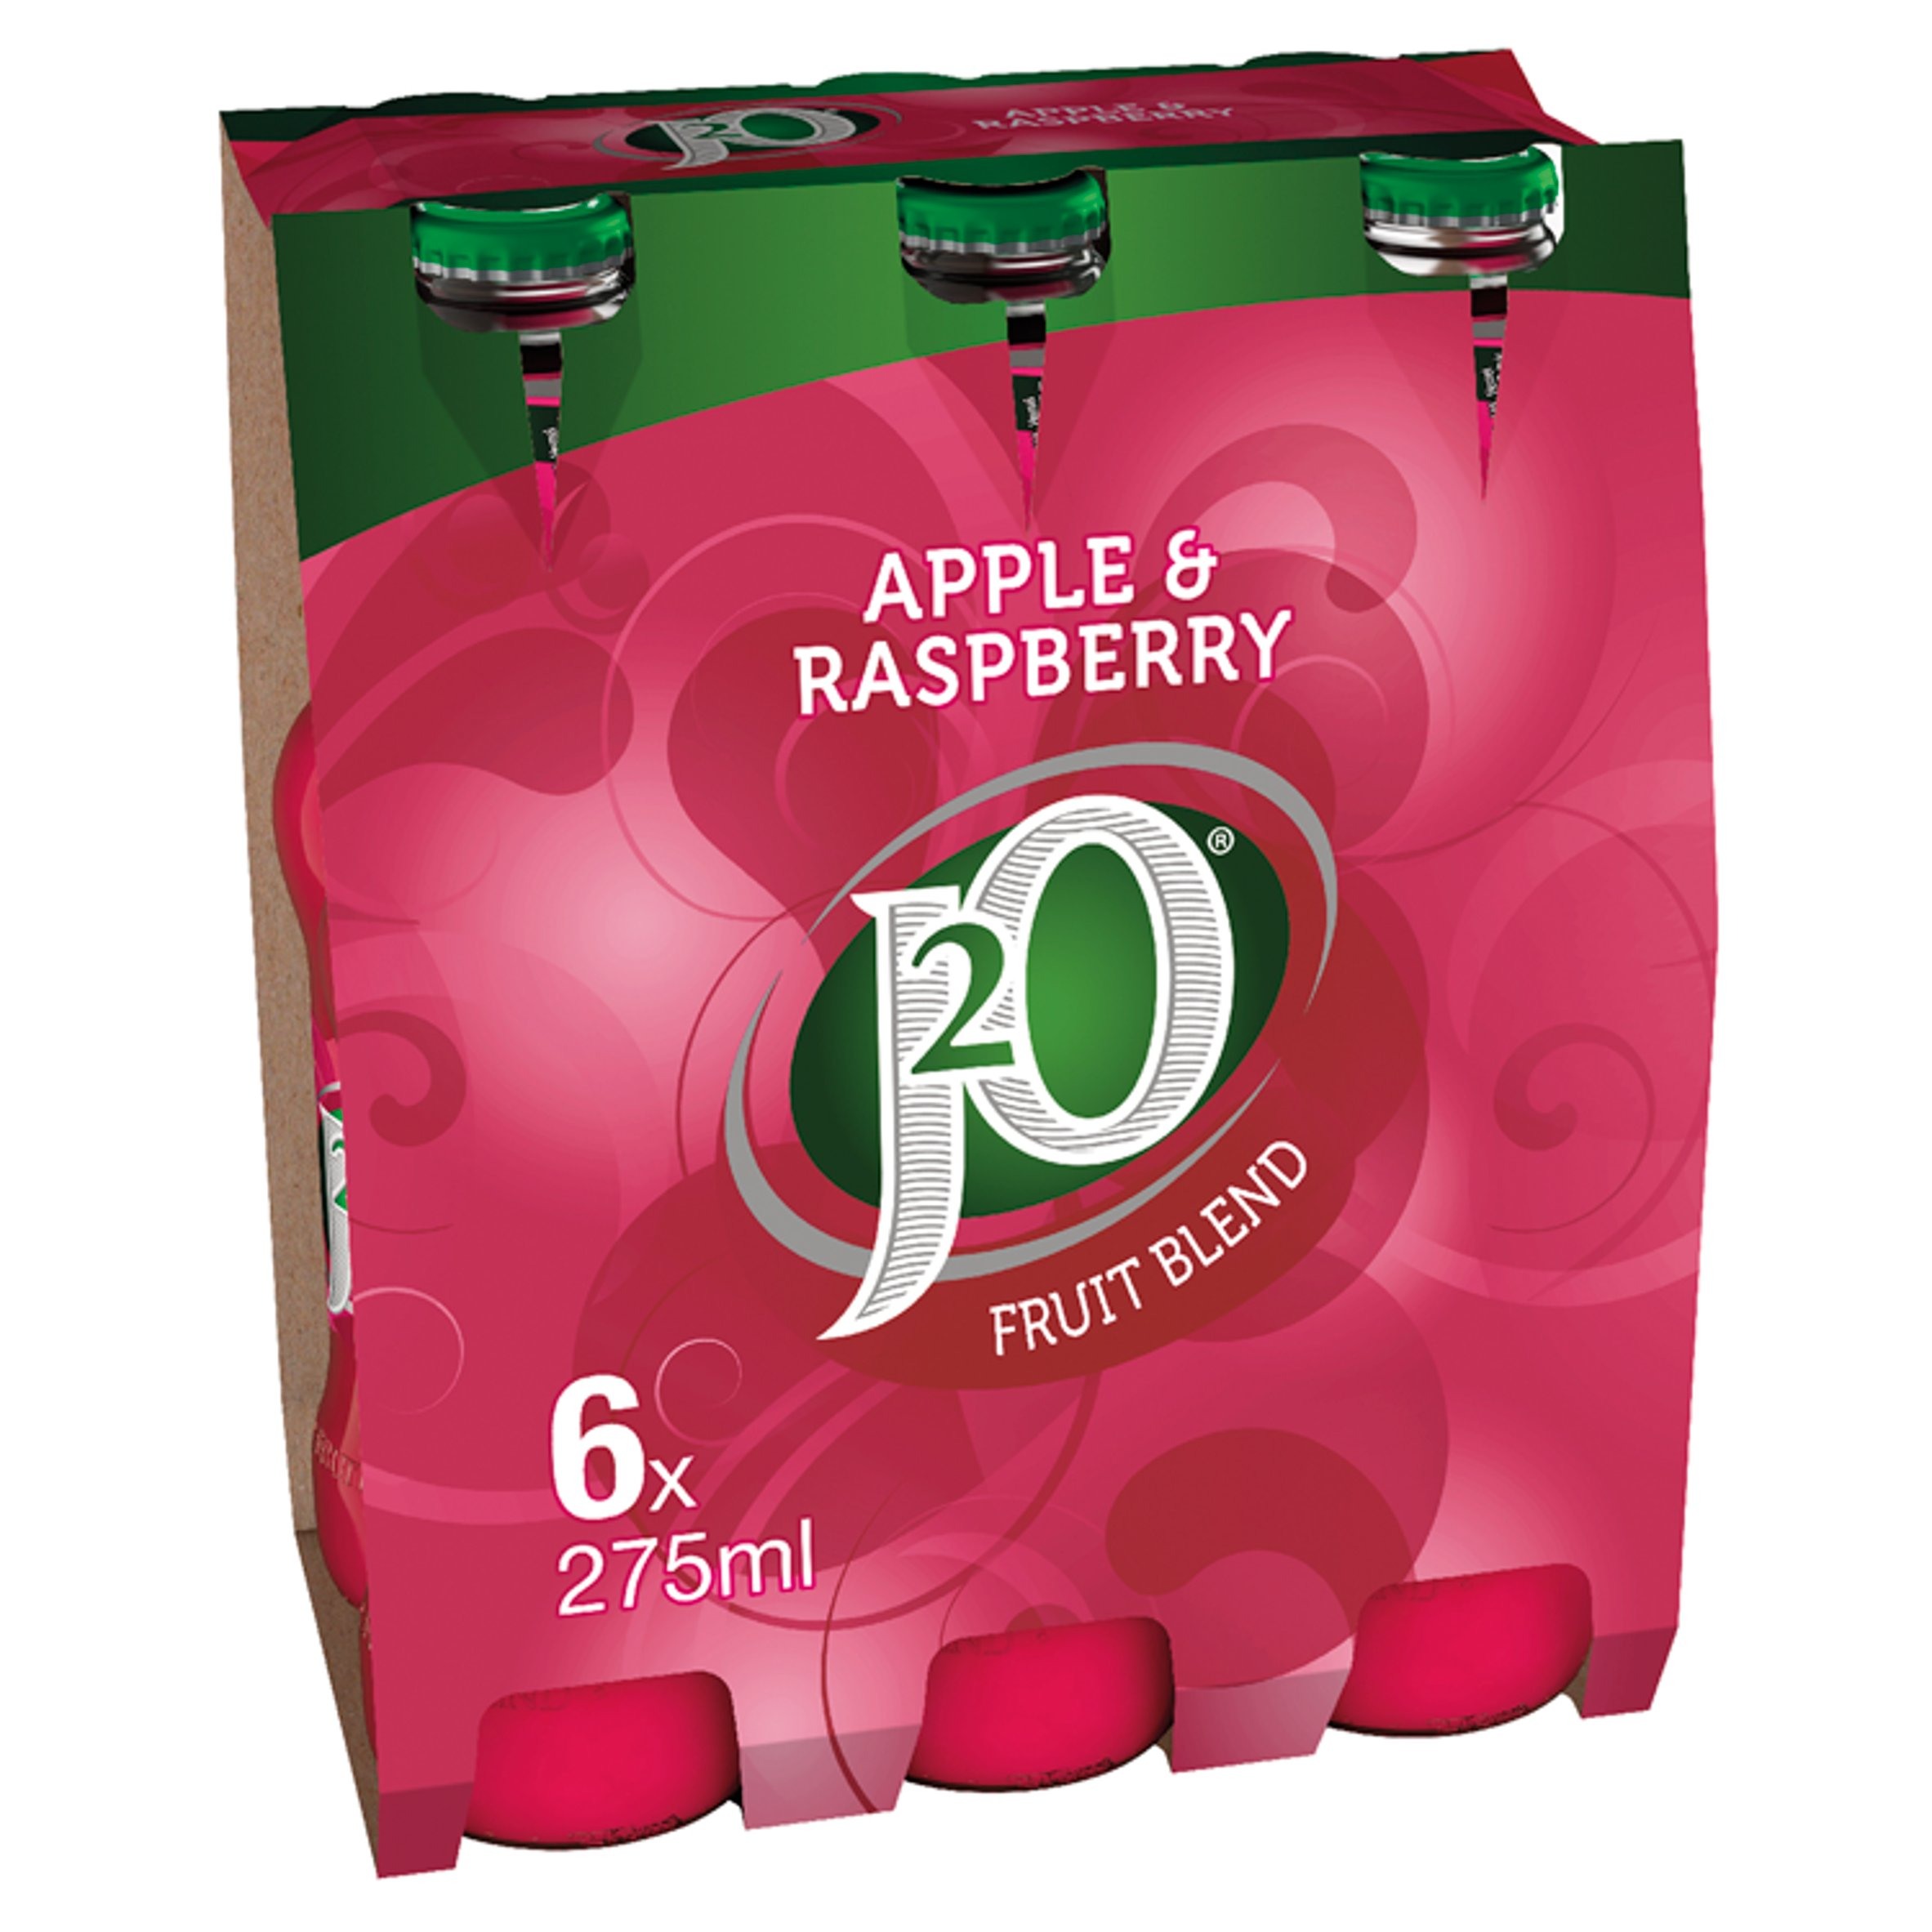 J20 Apple & Raspberry 275Ml X 6